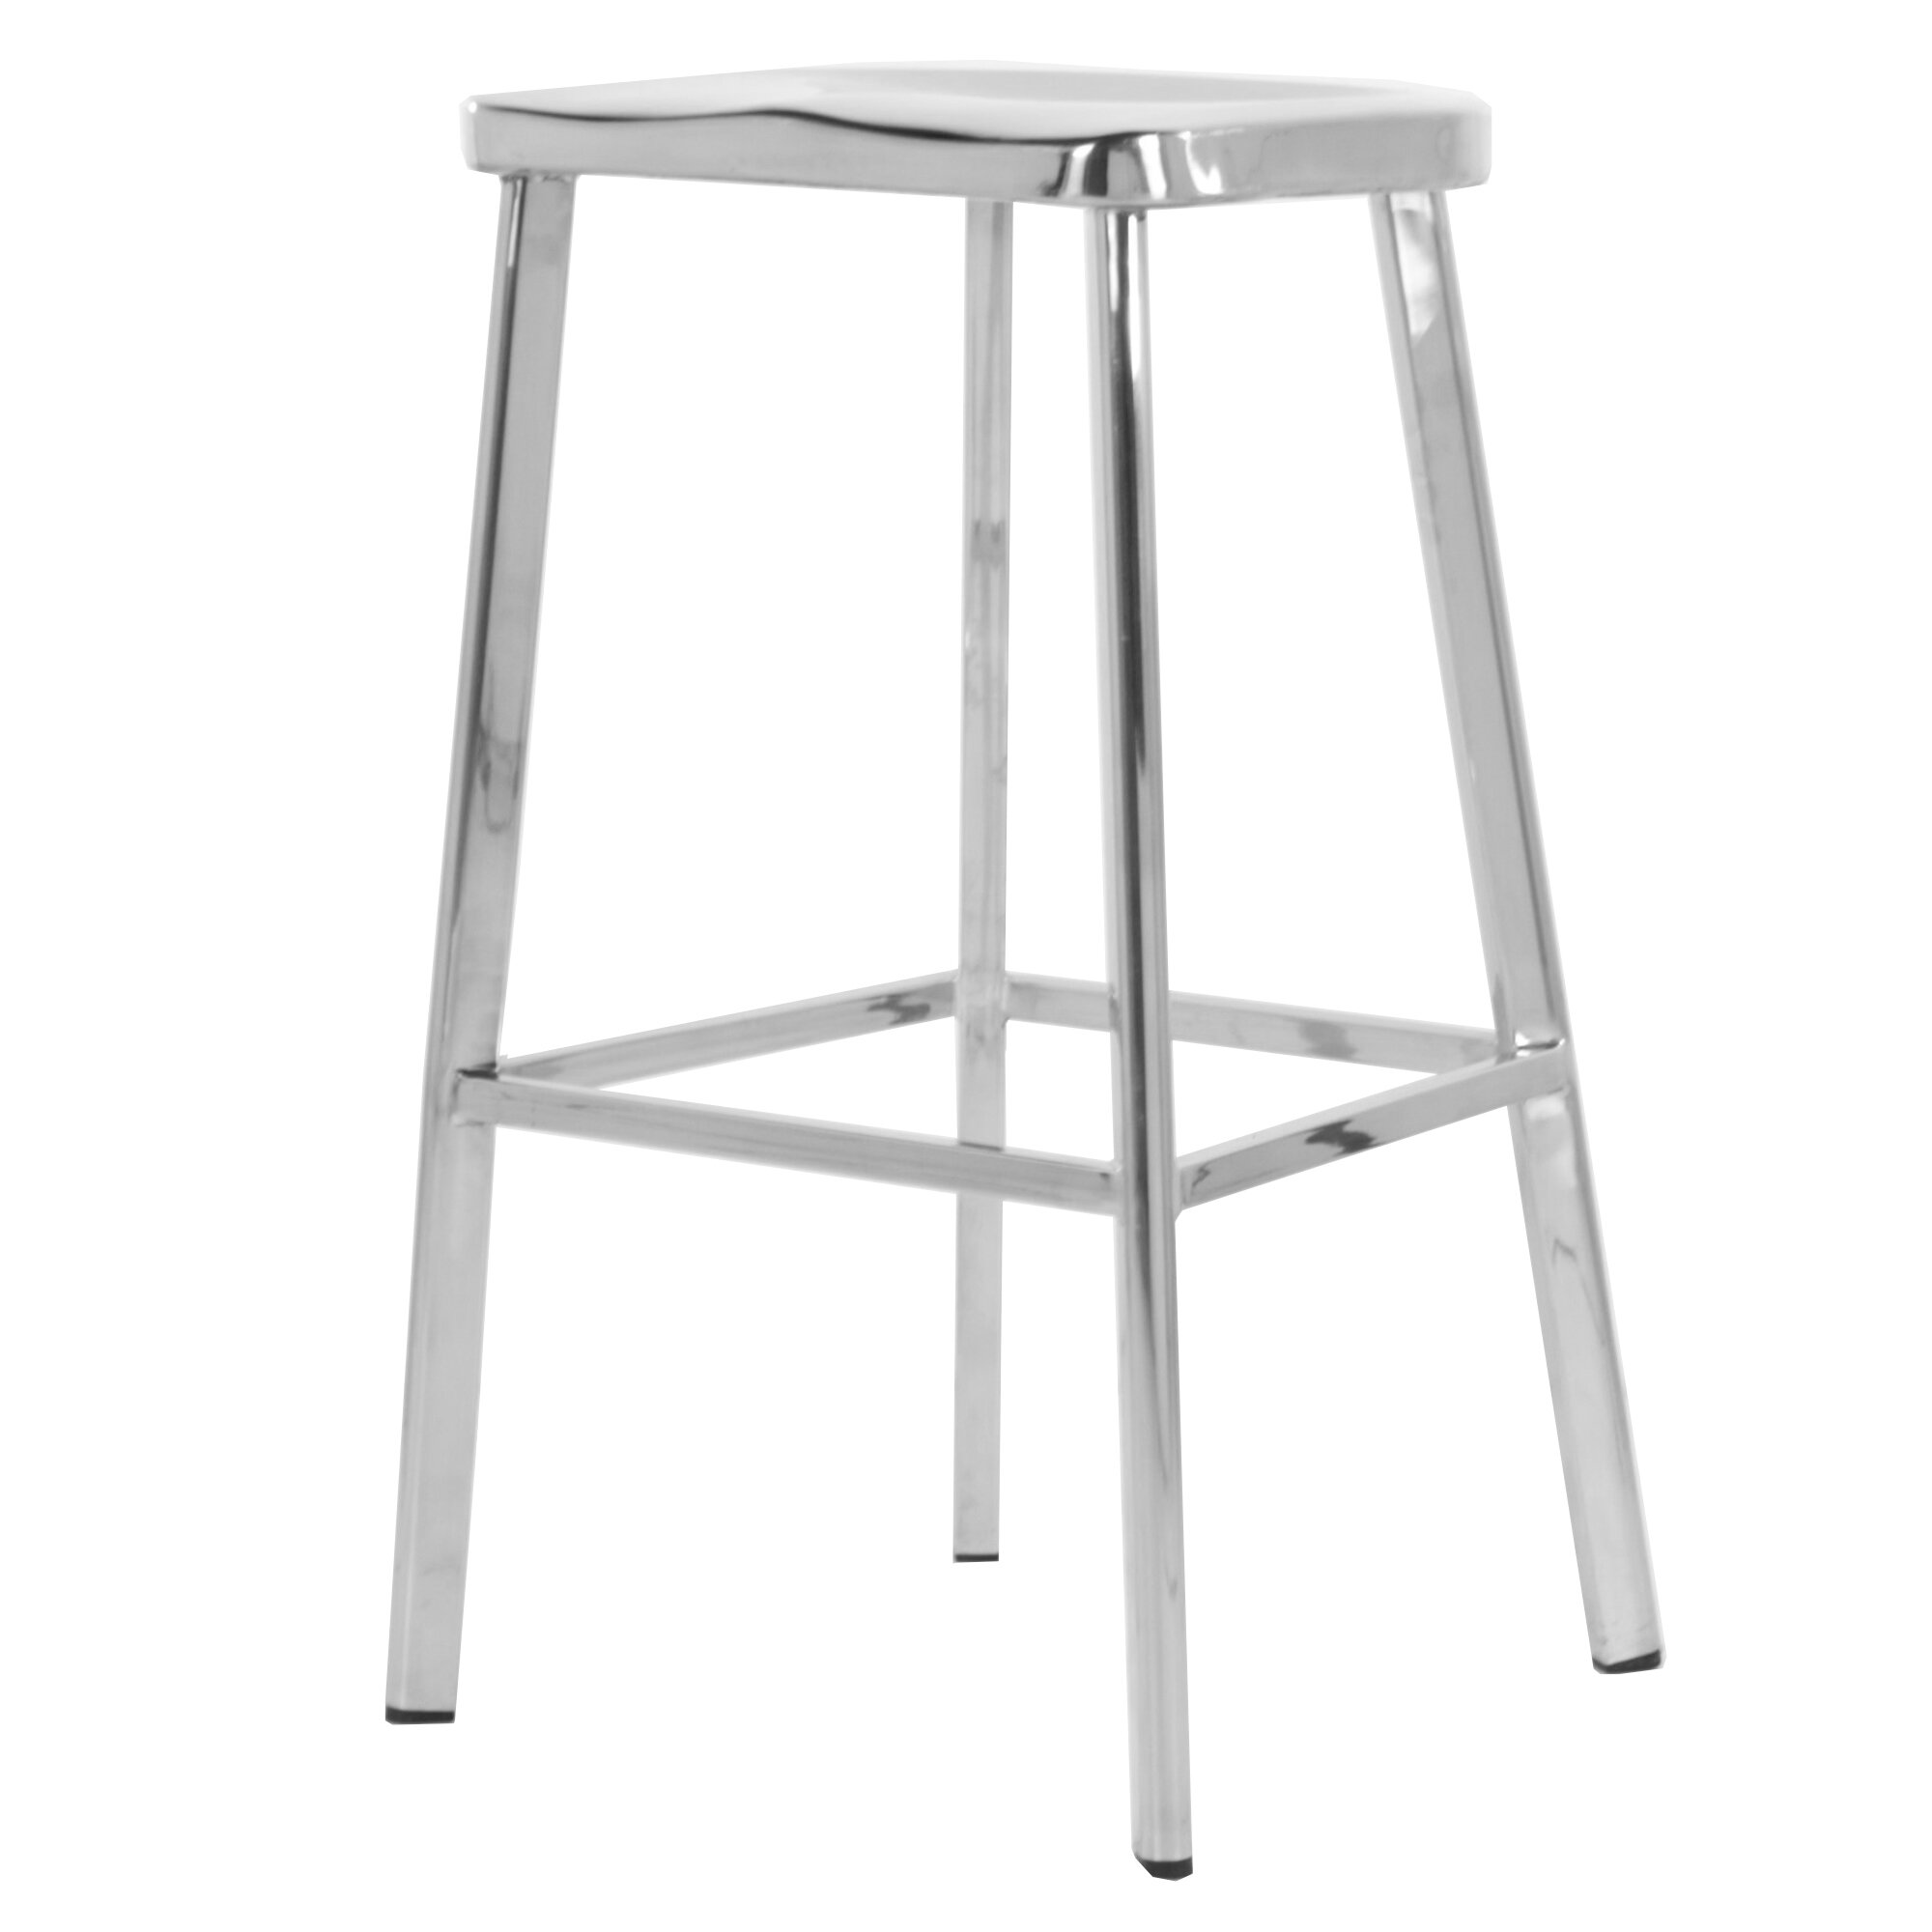 30 in bar stools. 30 in bar stools